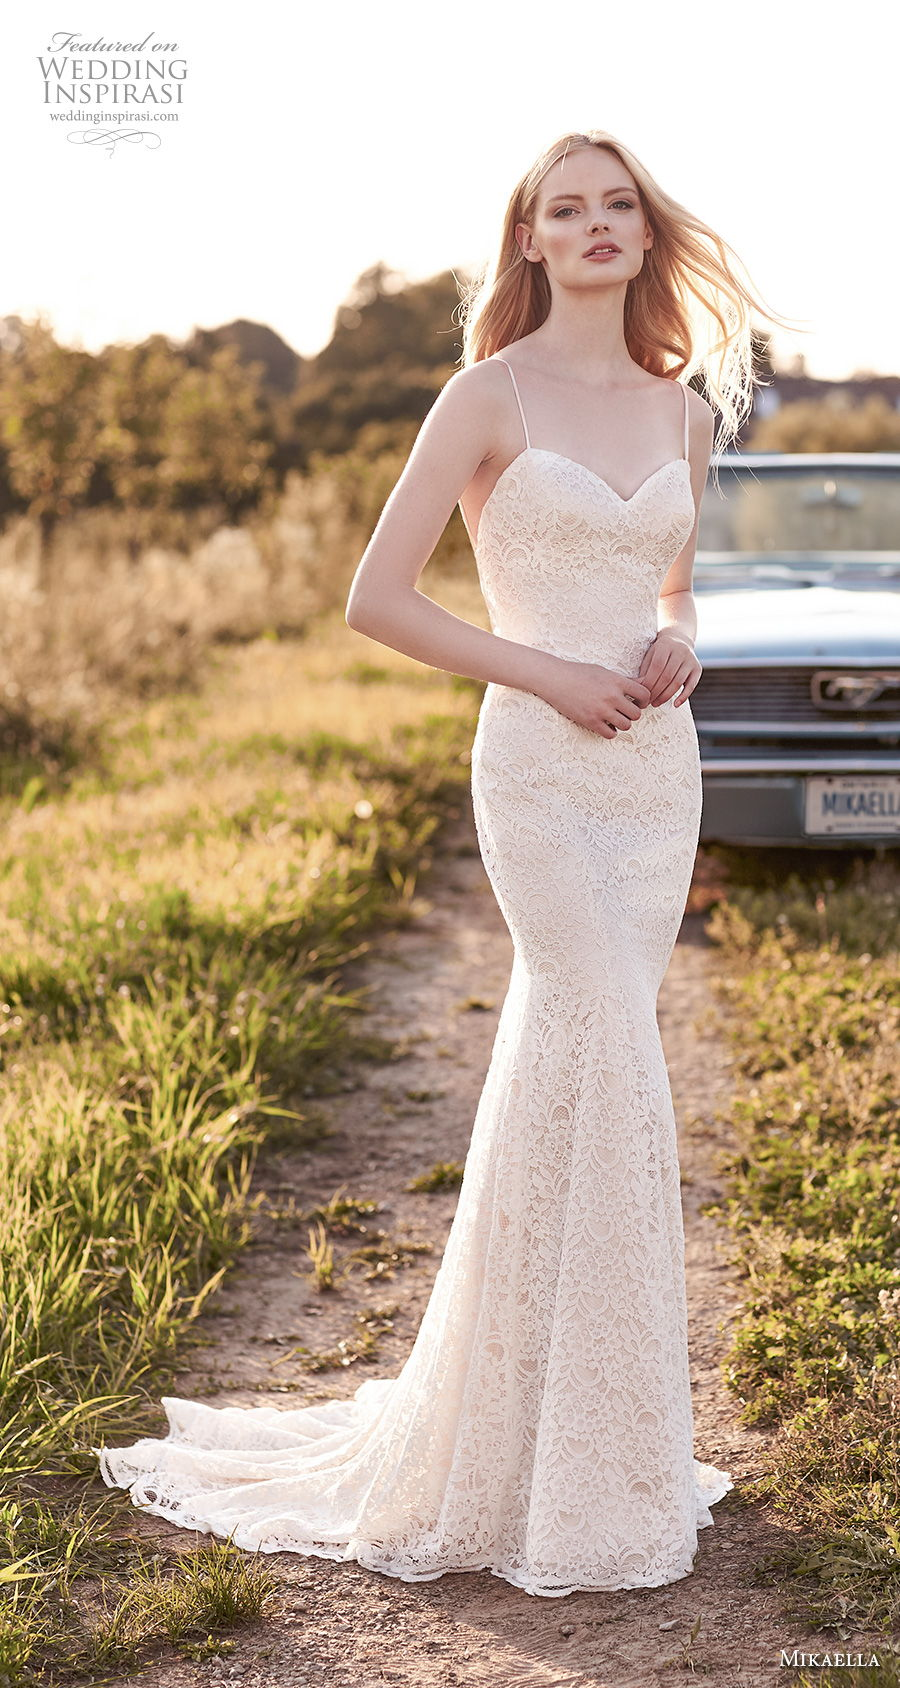 mikaella spring 2020 bridal spaghetti strap sweetheart neckline full embellishment elegant fit and flare sheath wedding dress backless low back short train (7) mv